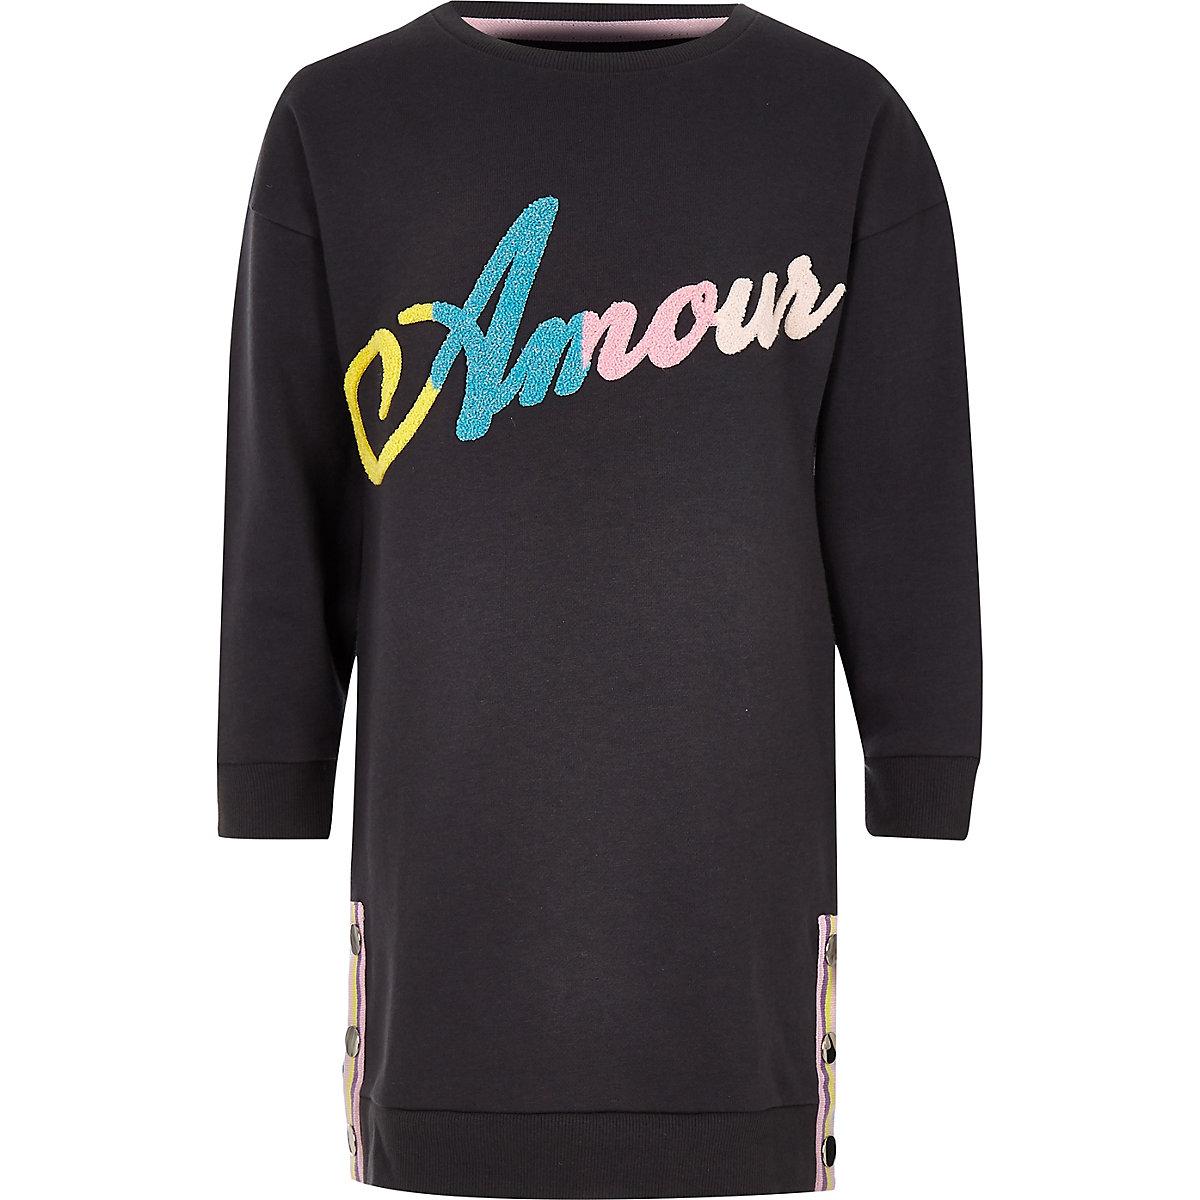 Girls dark grey 'Amour' sweater dress